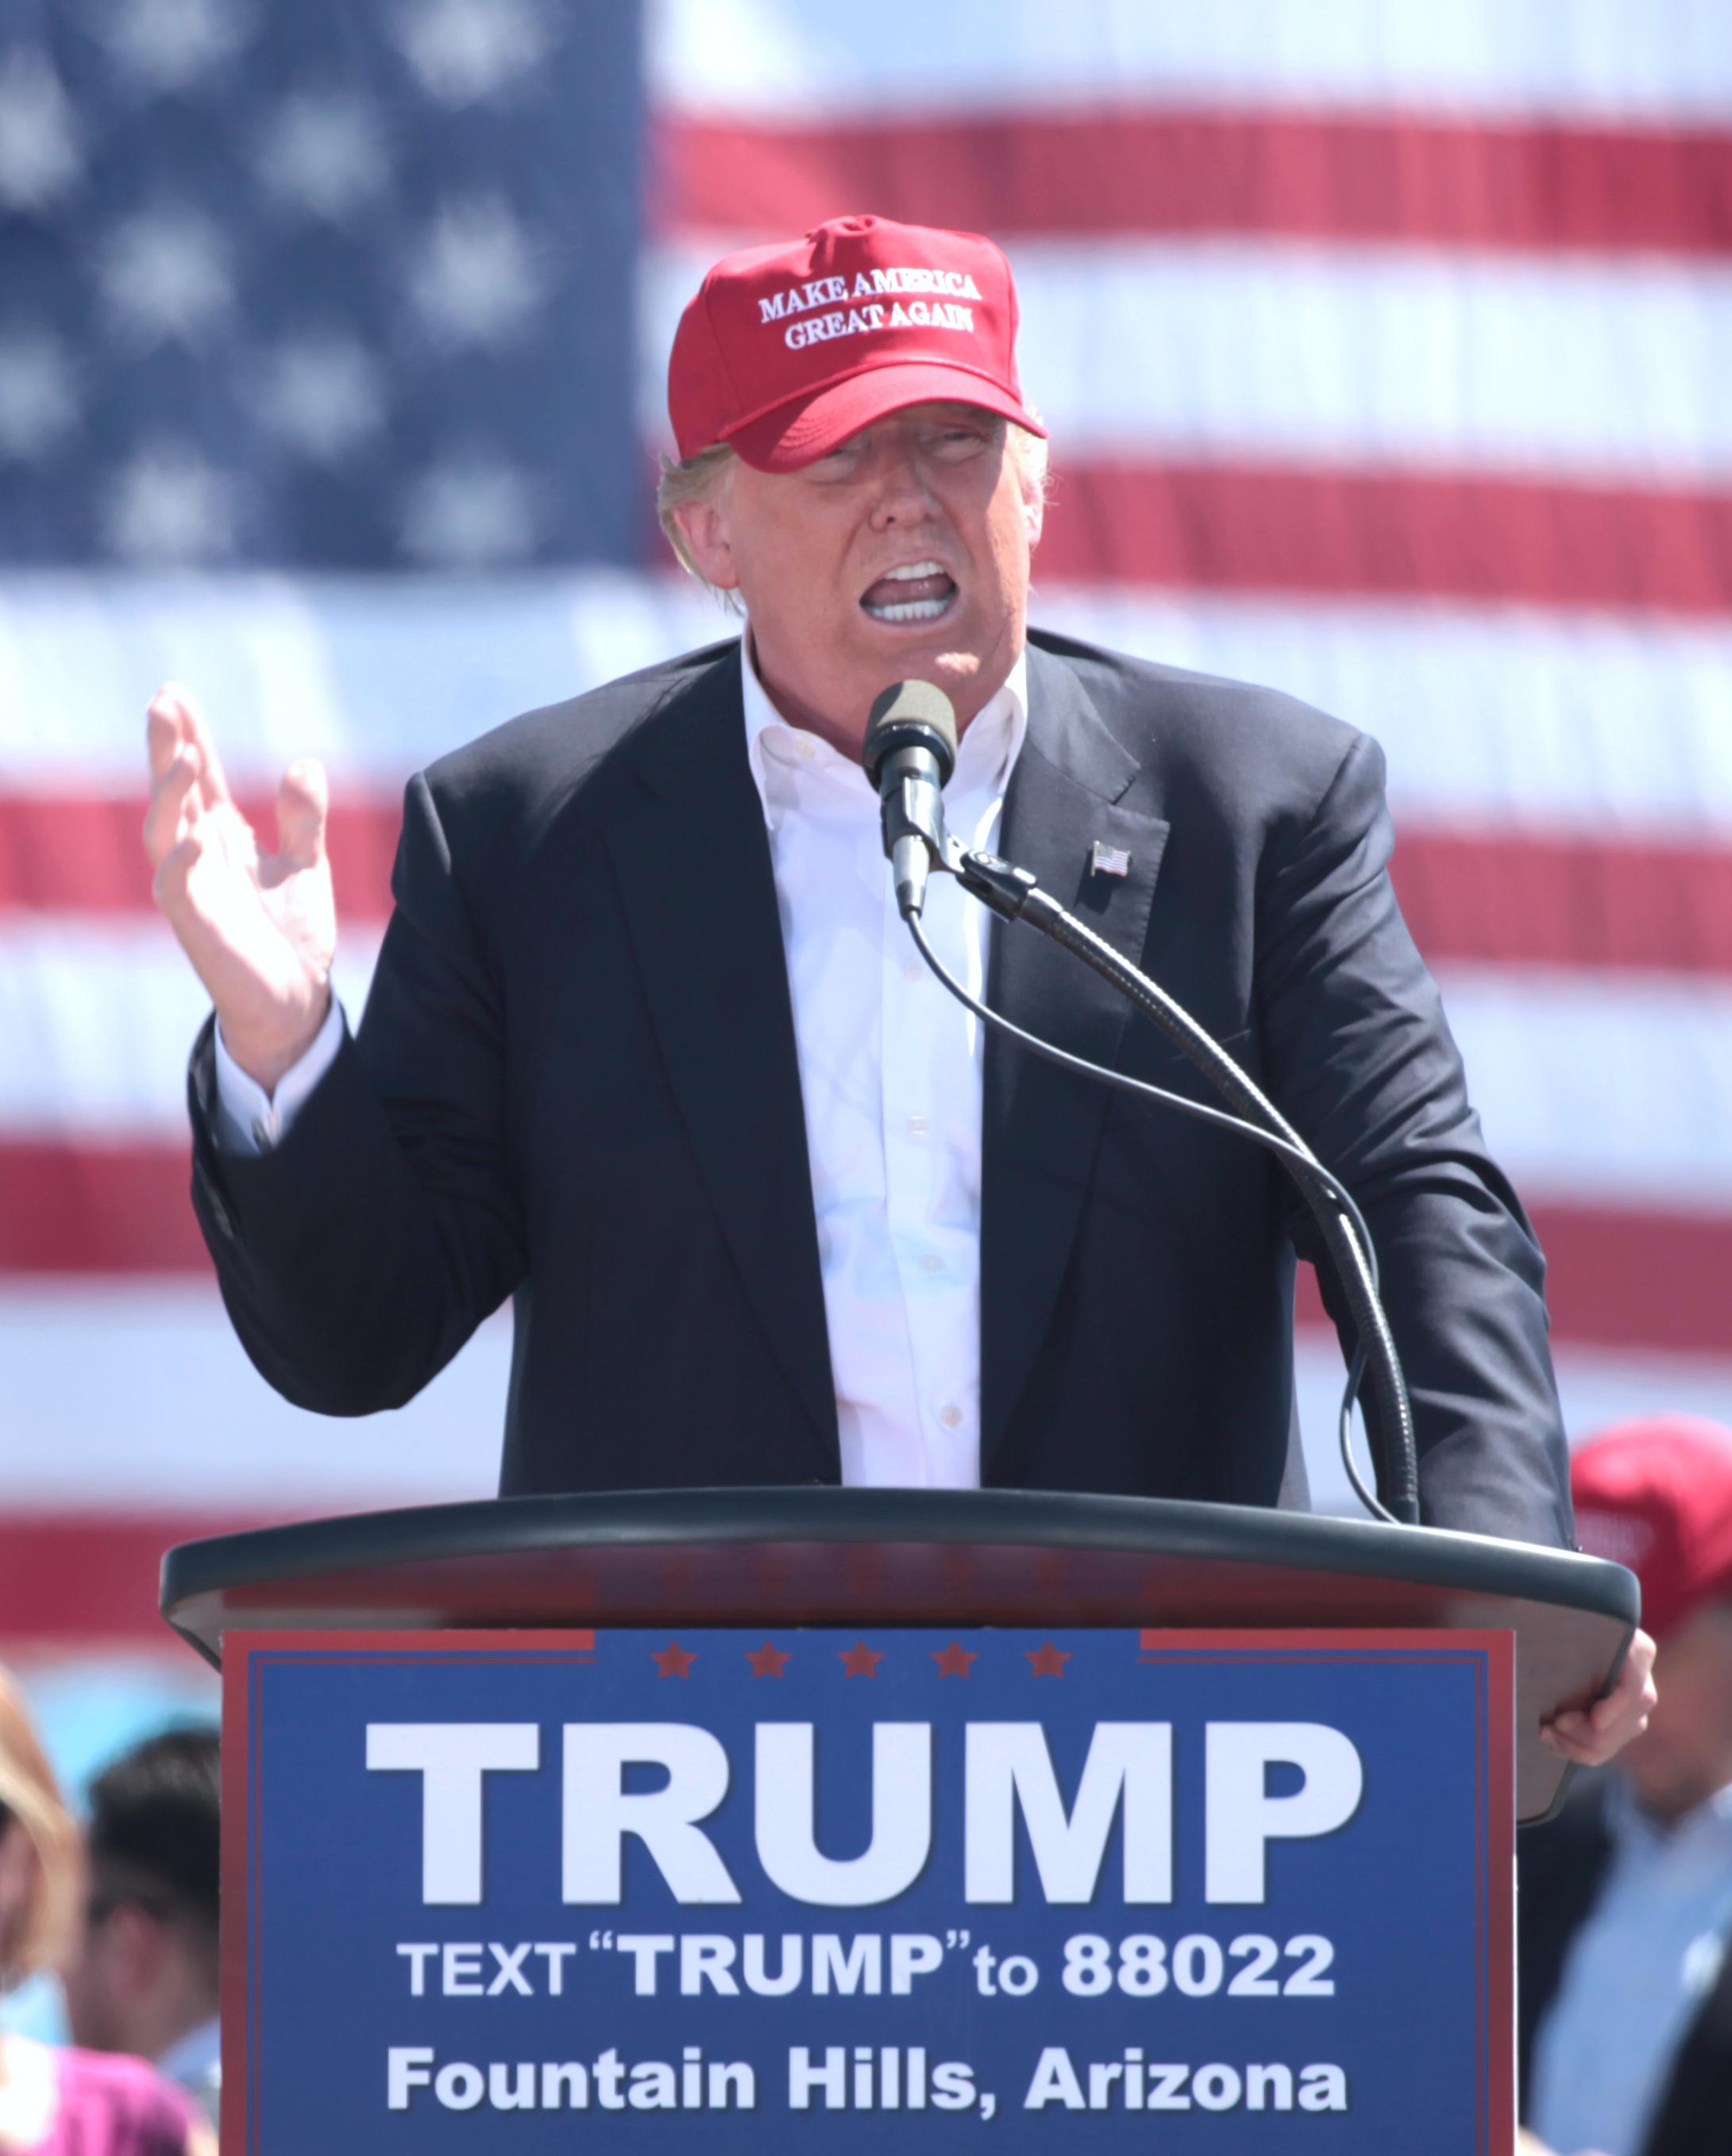 Trump campaigning in Fountain Hills, Arizona, March 2016